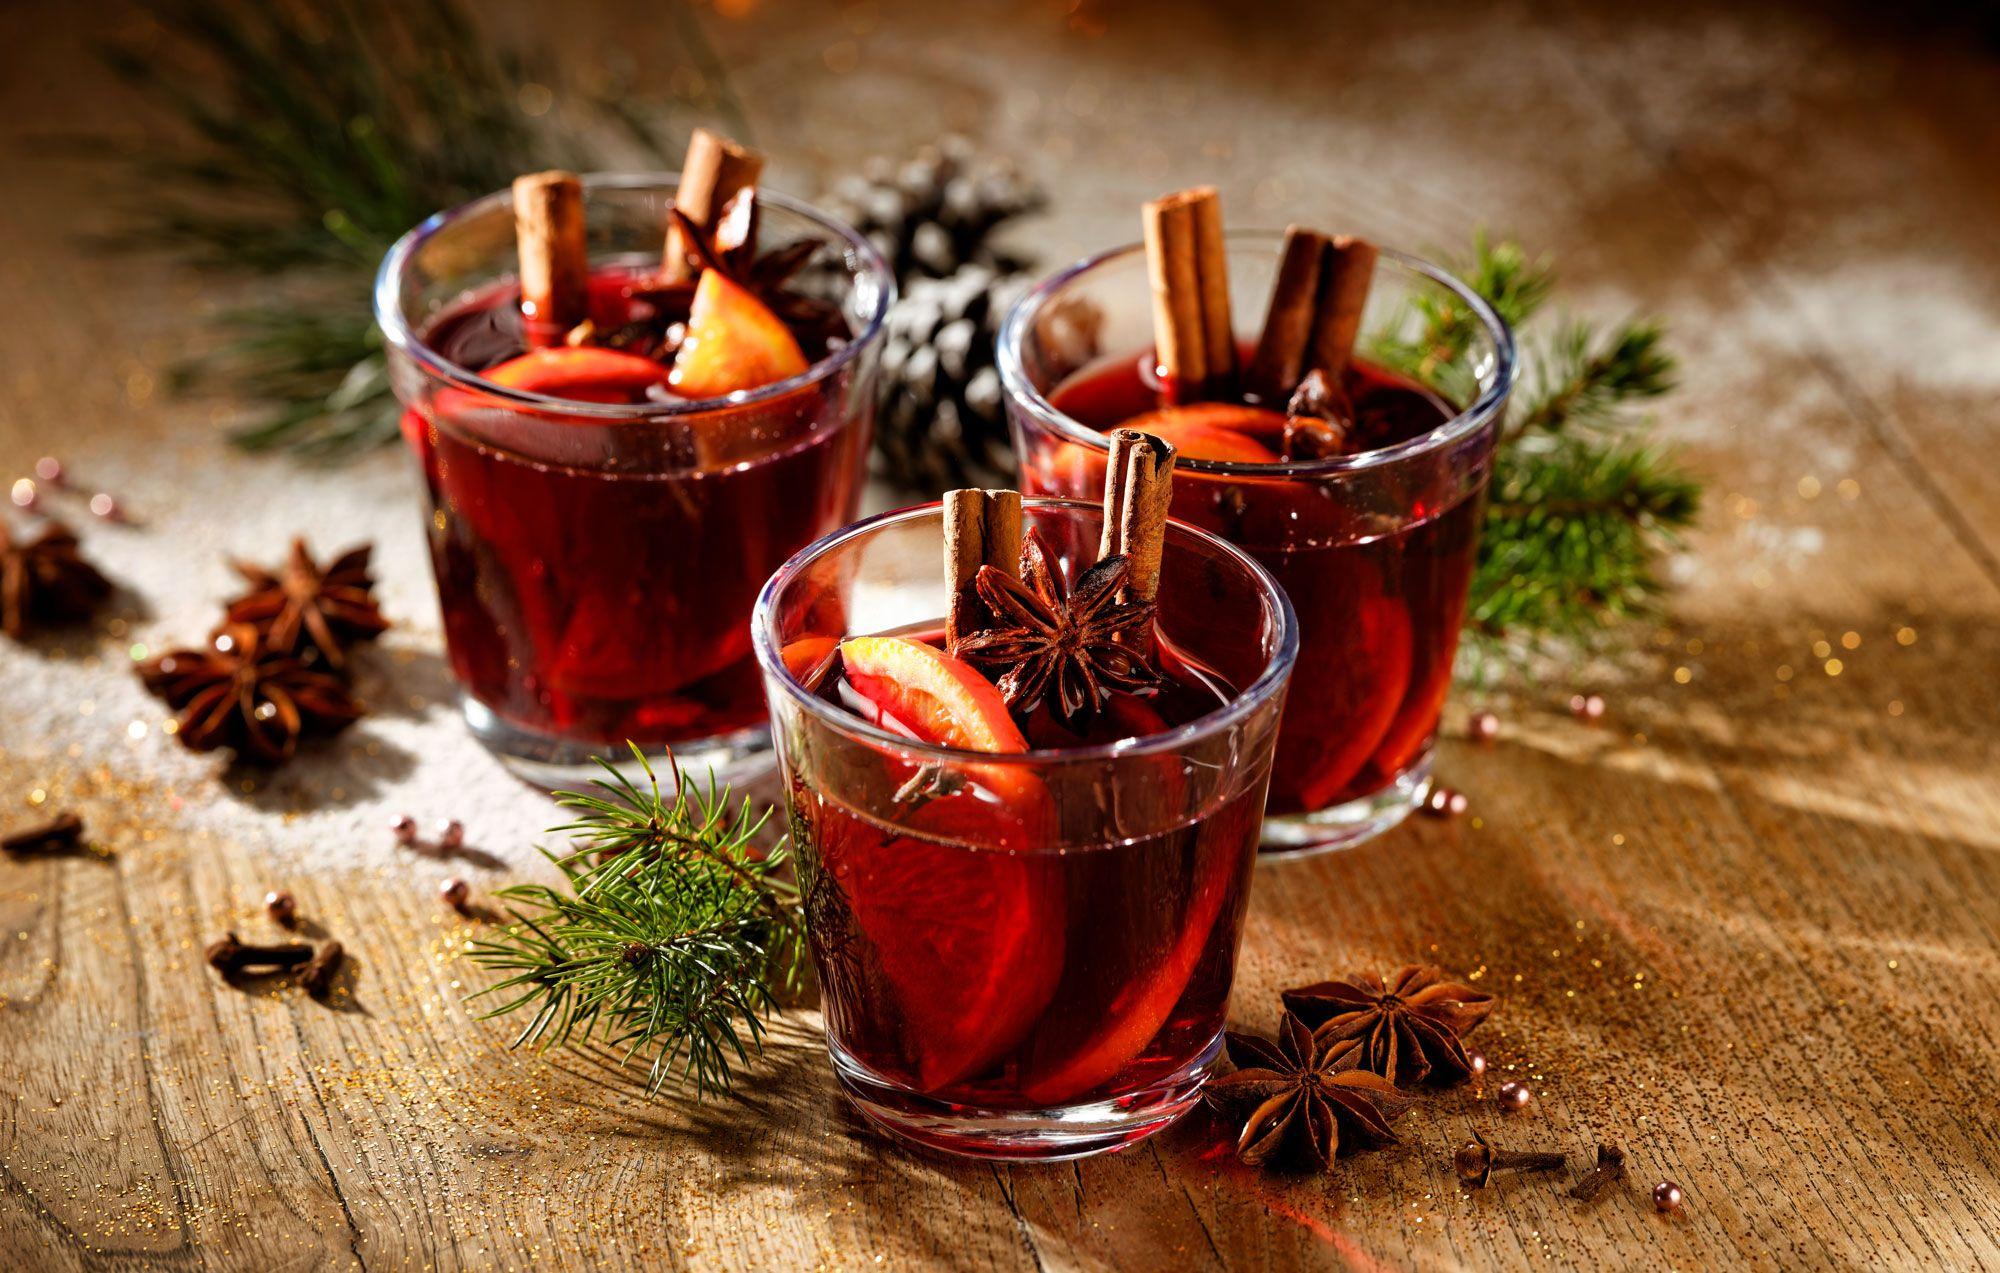 Nothing Like Mulled Wine With A Twist Of Spices To Keep You Warm This Season Eda I Vino Domashnij Recept Alkogolnyj Napitok